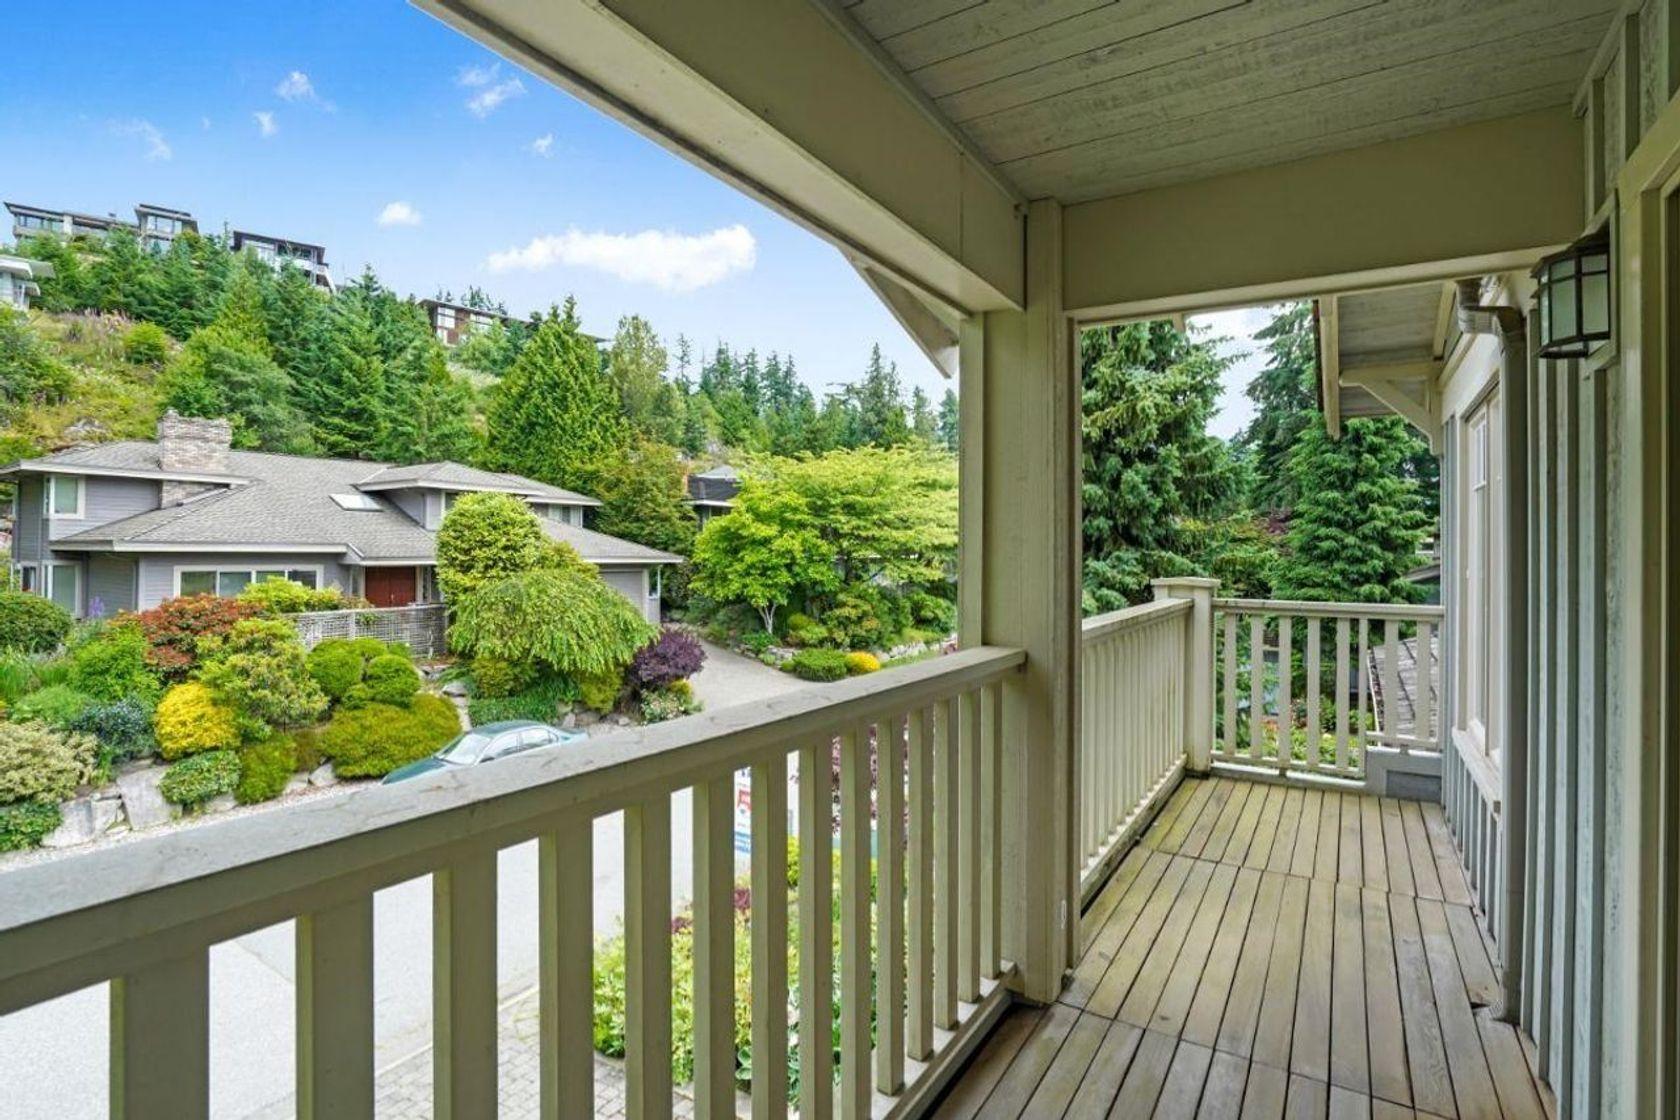 4898-meadfeild-road-caulfeild-west-vancouver-25 at 4898 Meadfeild Road, Caulfeild, West Vancouver